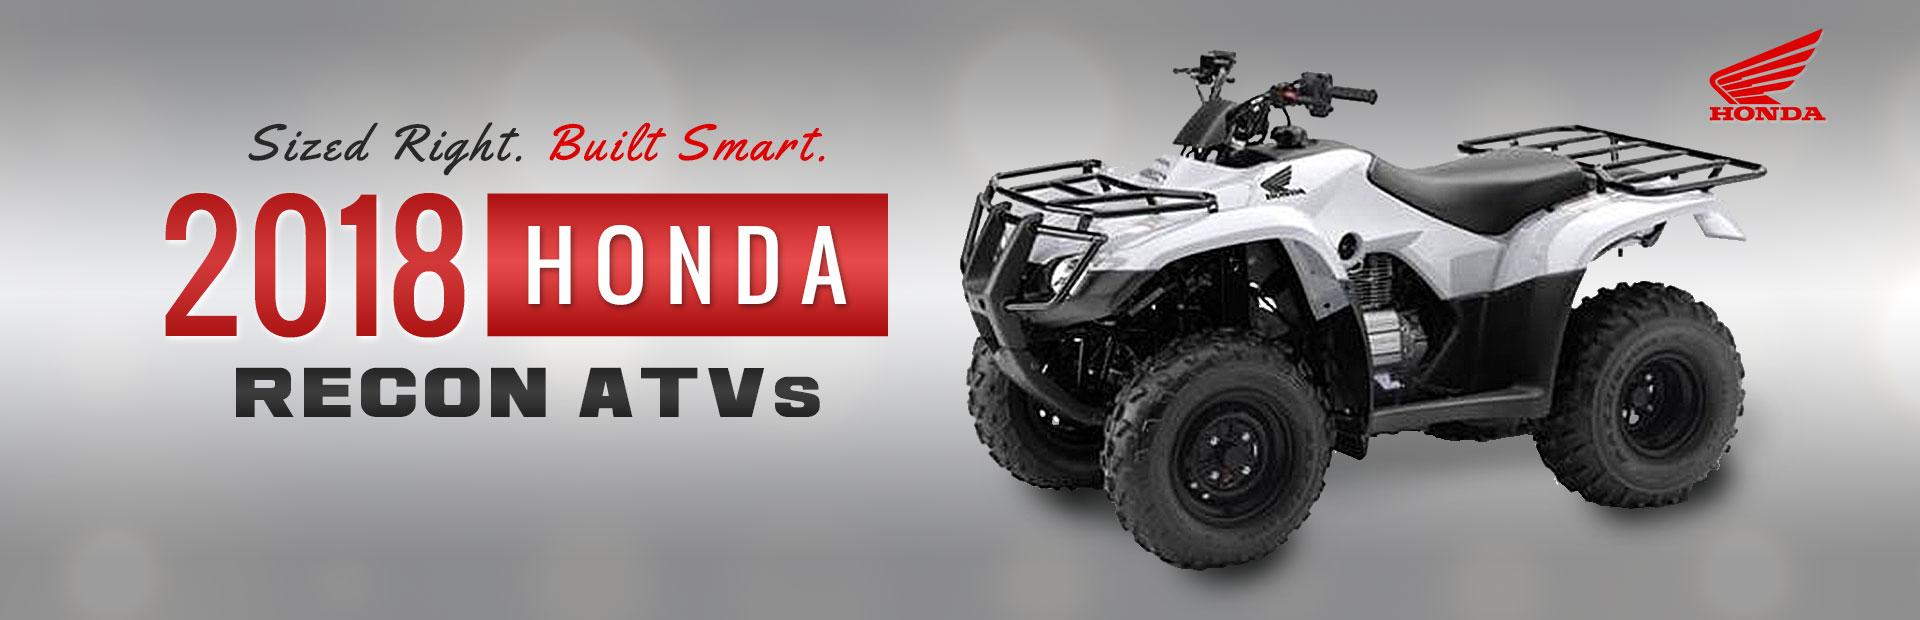 2018 Honda Recon ATVs